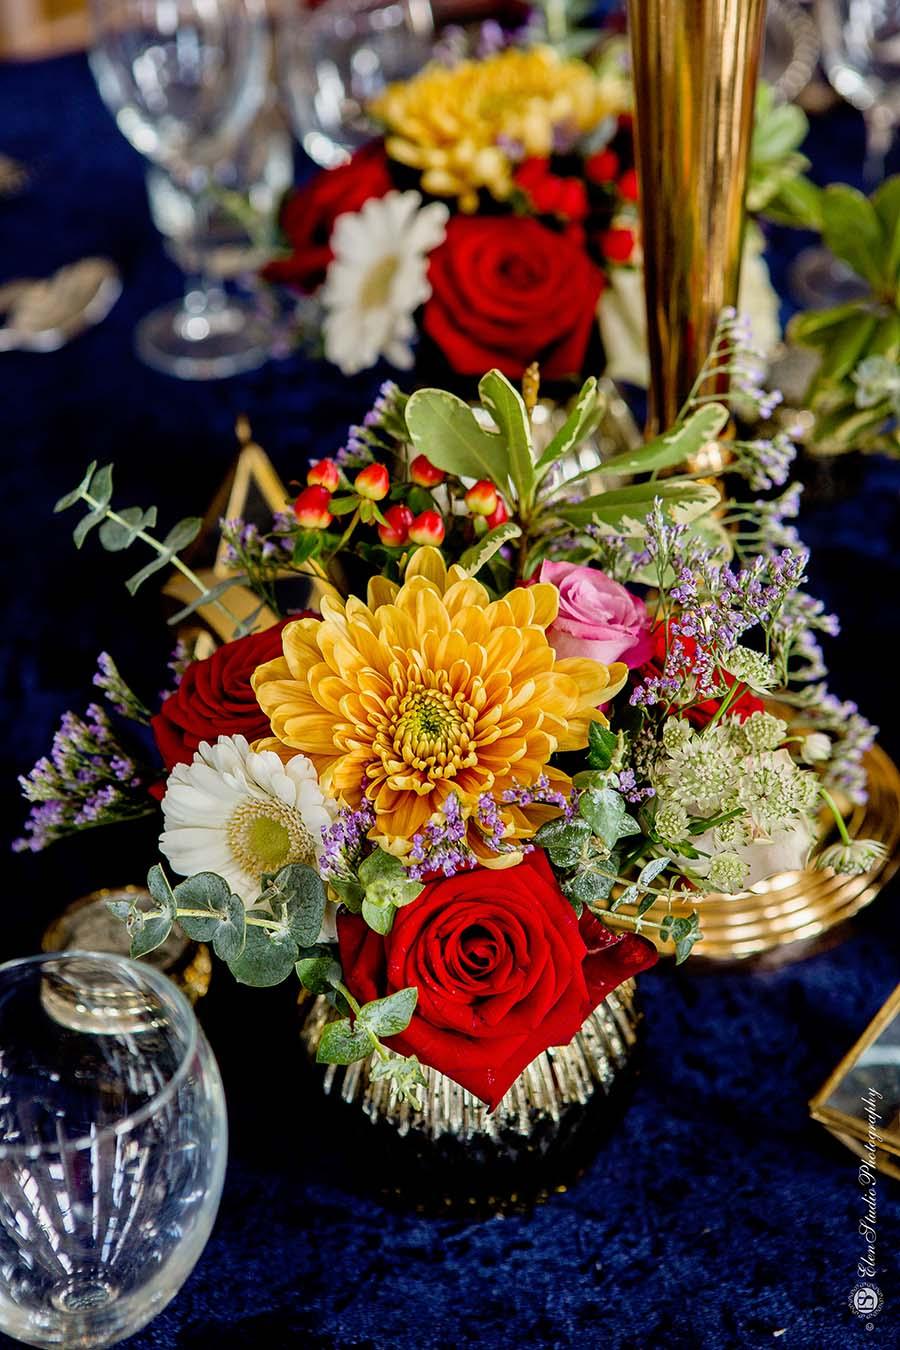 Hodsock-priory-wedding-fair-Elen-Studio-Photography-022